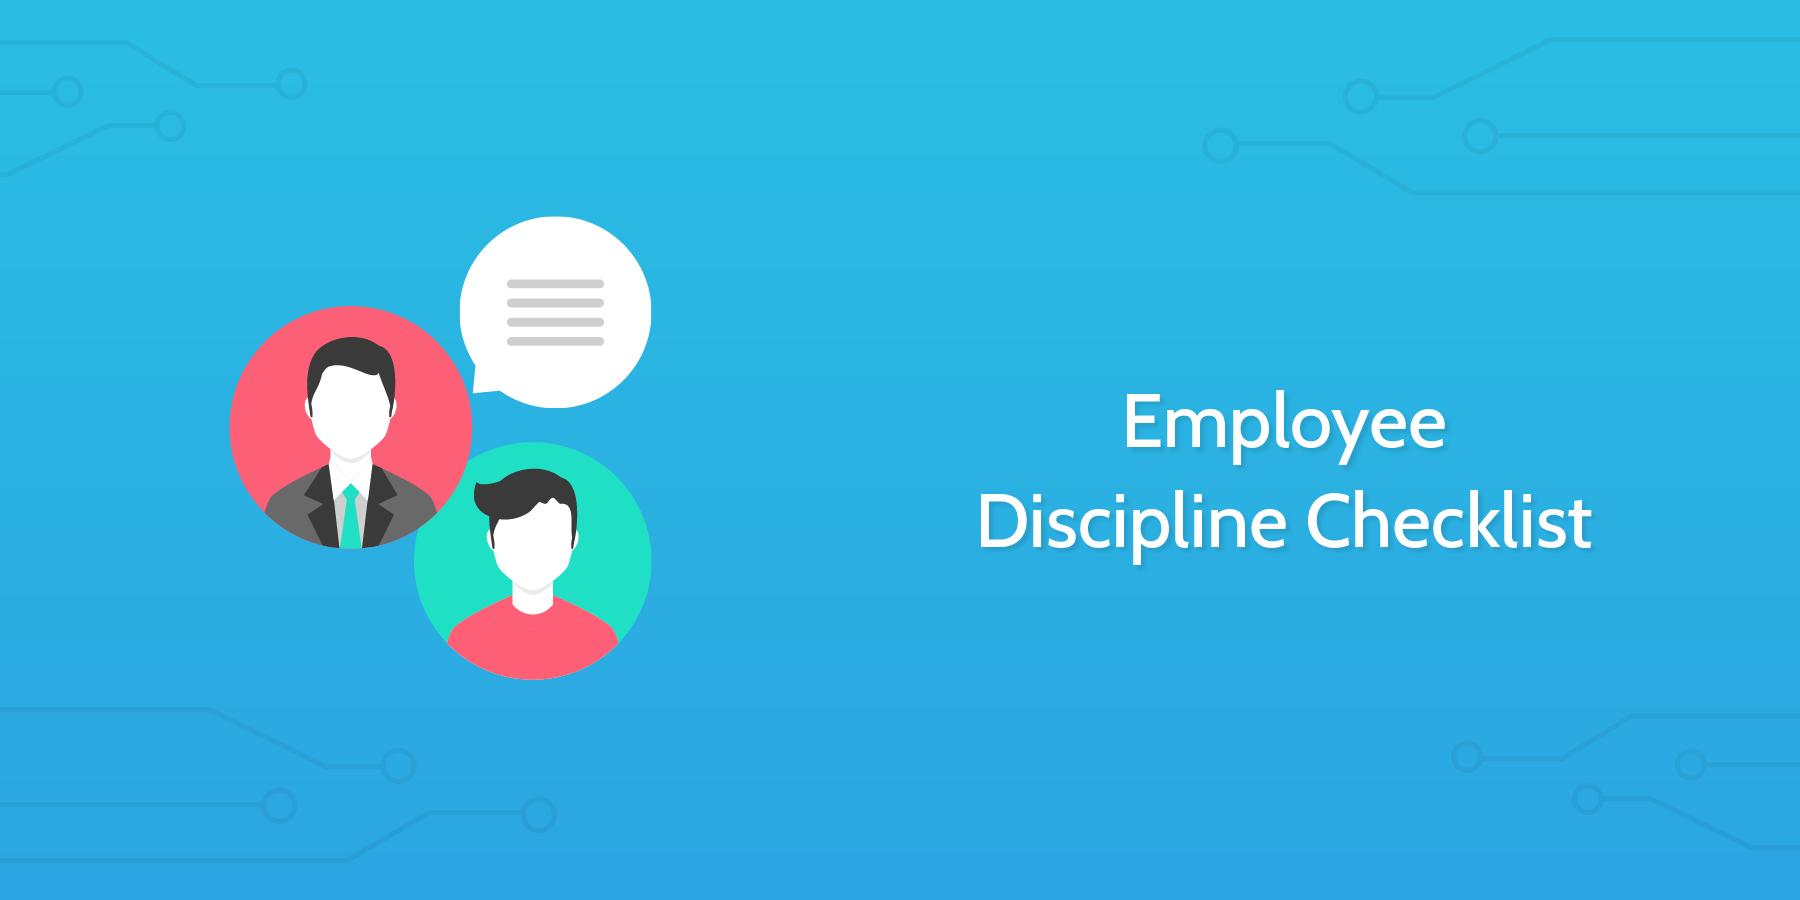 A Checklist for Employee Discipline